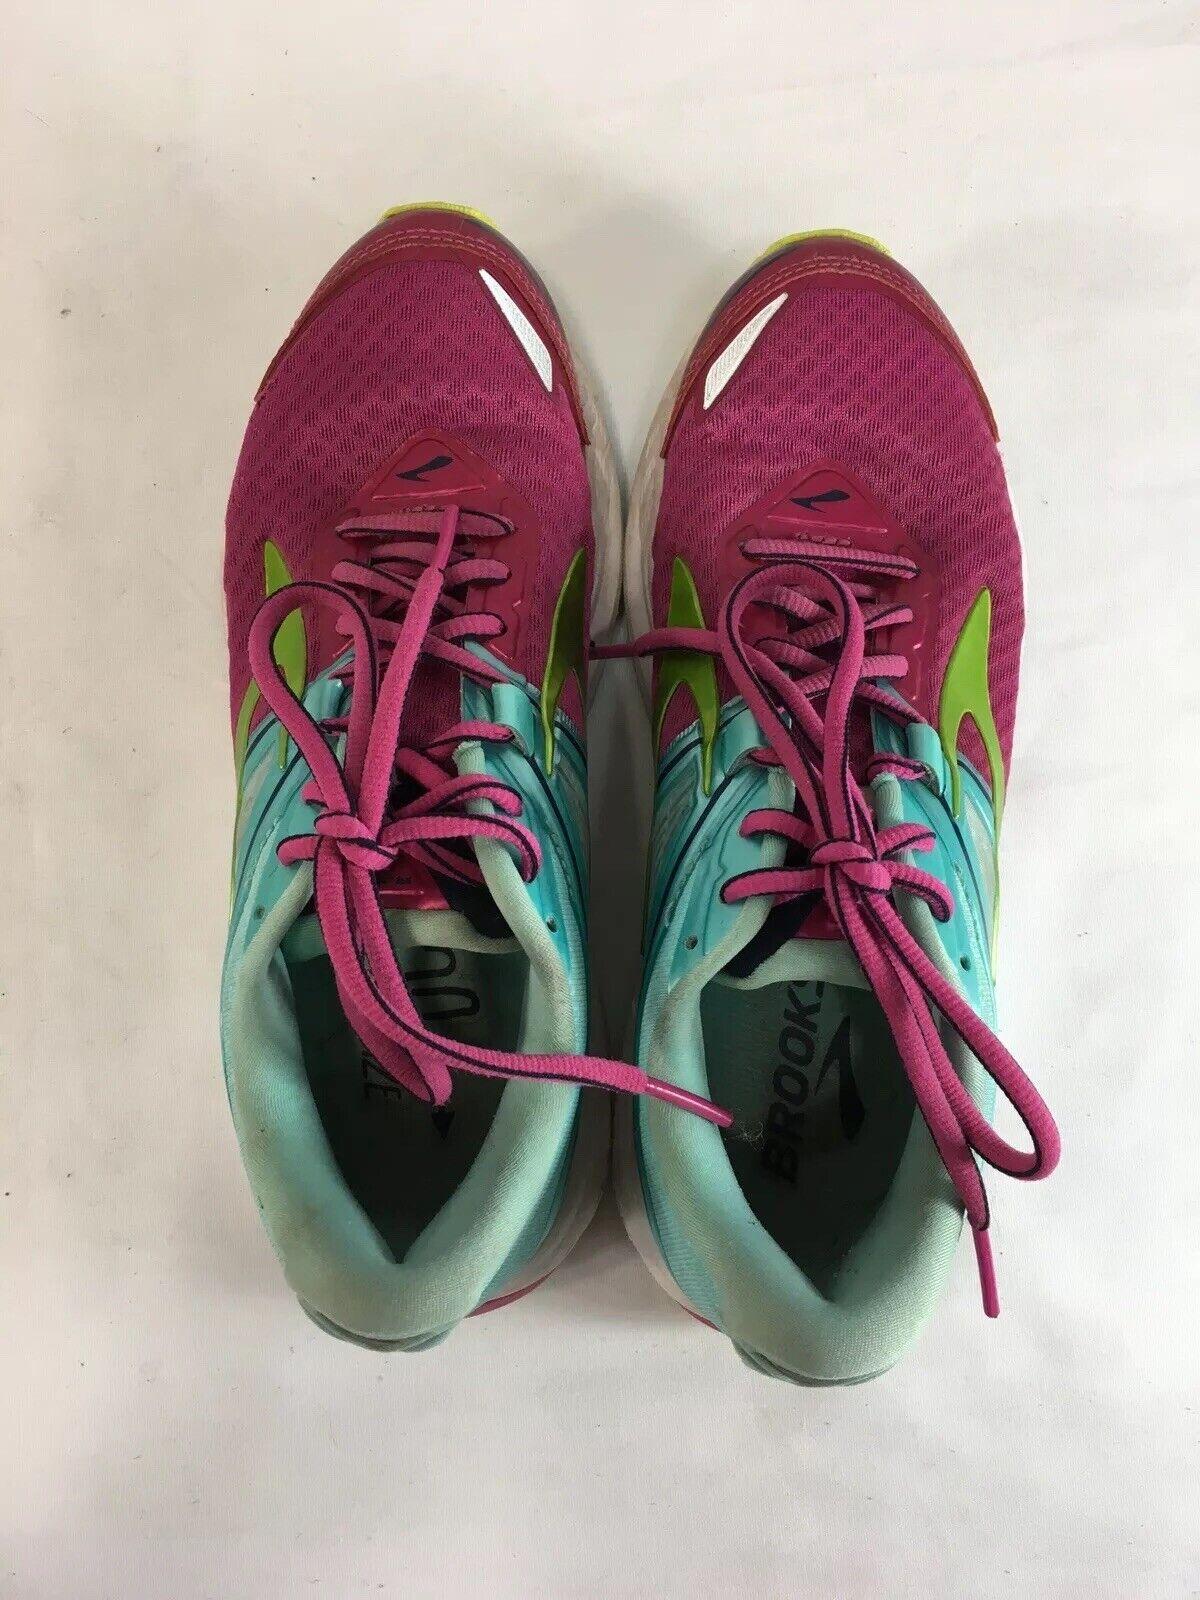 Brooks Ravenna 8 Turnschuhe schuhe damen 6.5 Rosa Blau Blau Blau Grün Running Lace Up 153b32